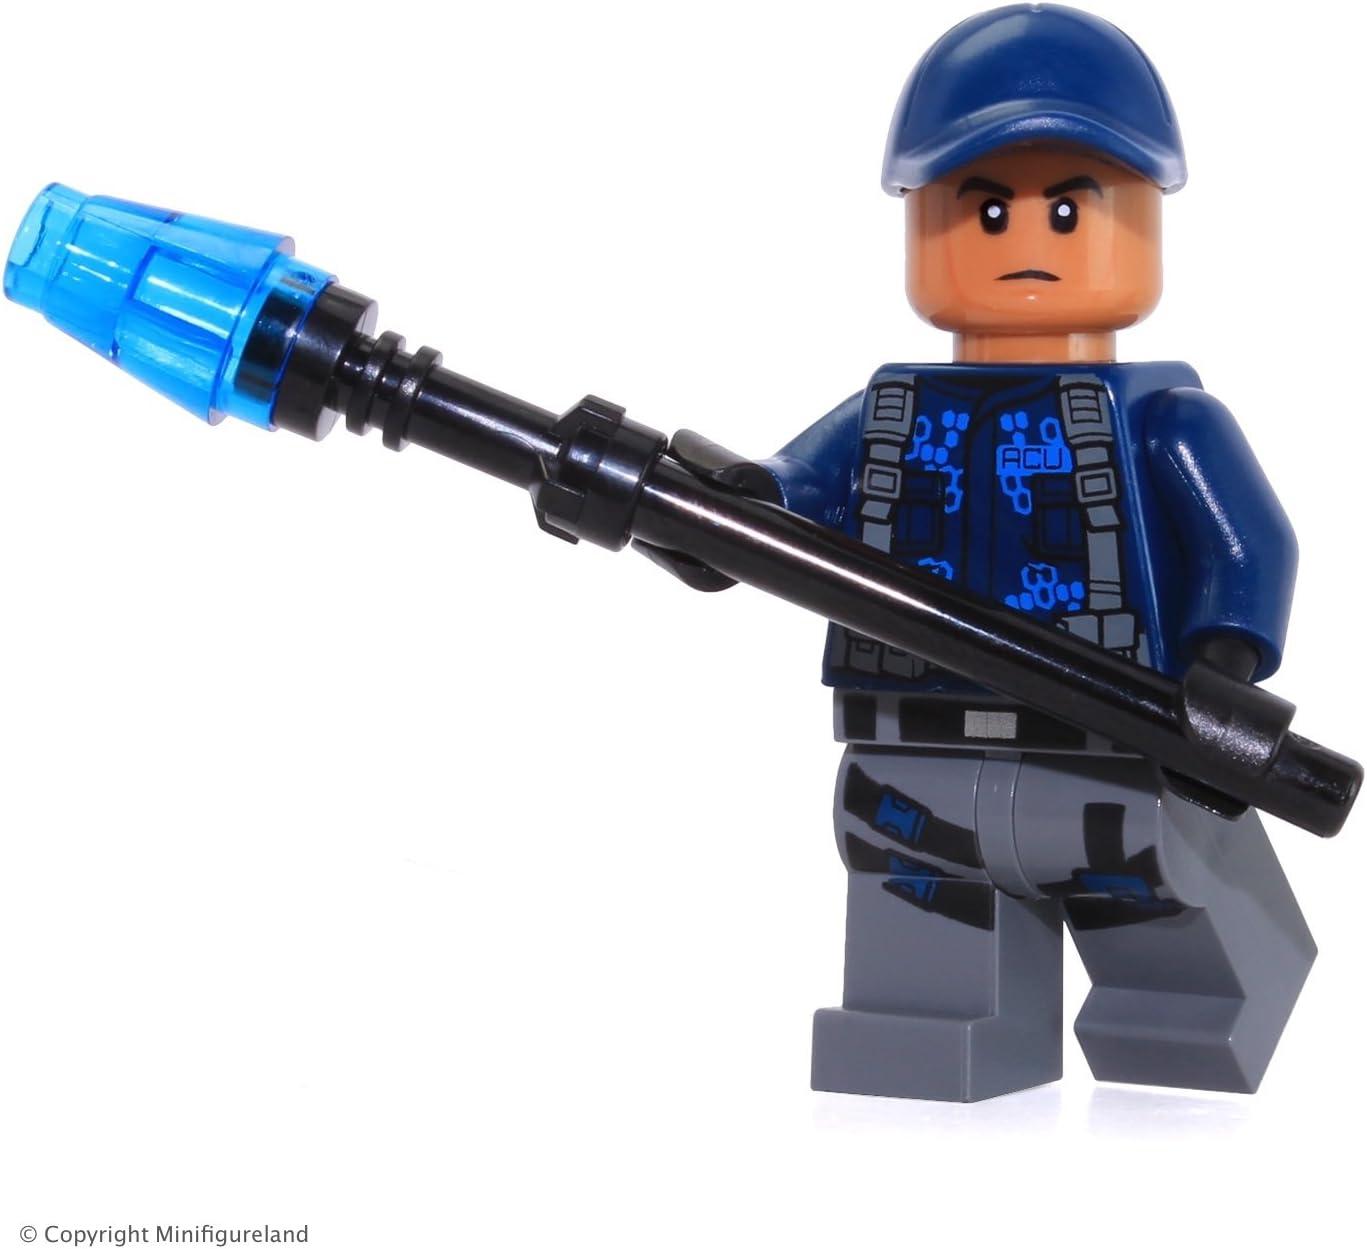 LEGO Jurassic World ACU Minifigure with Shocklance